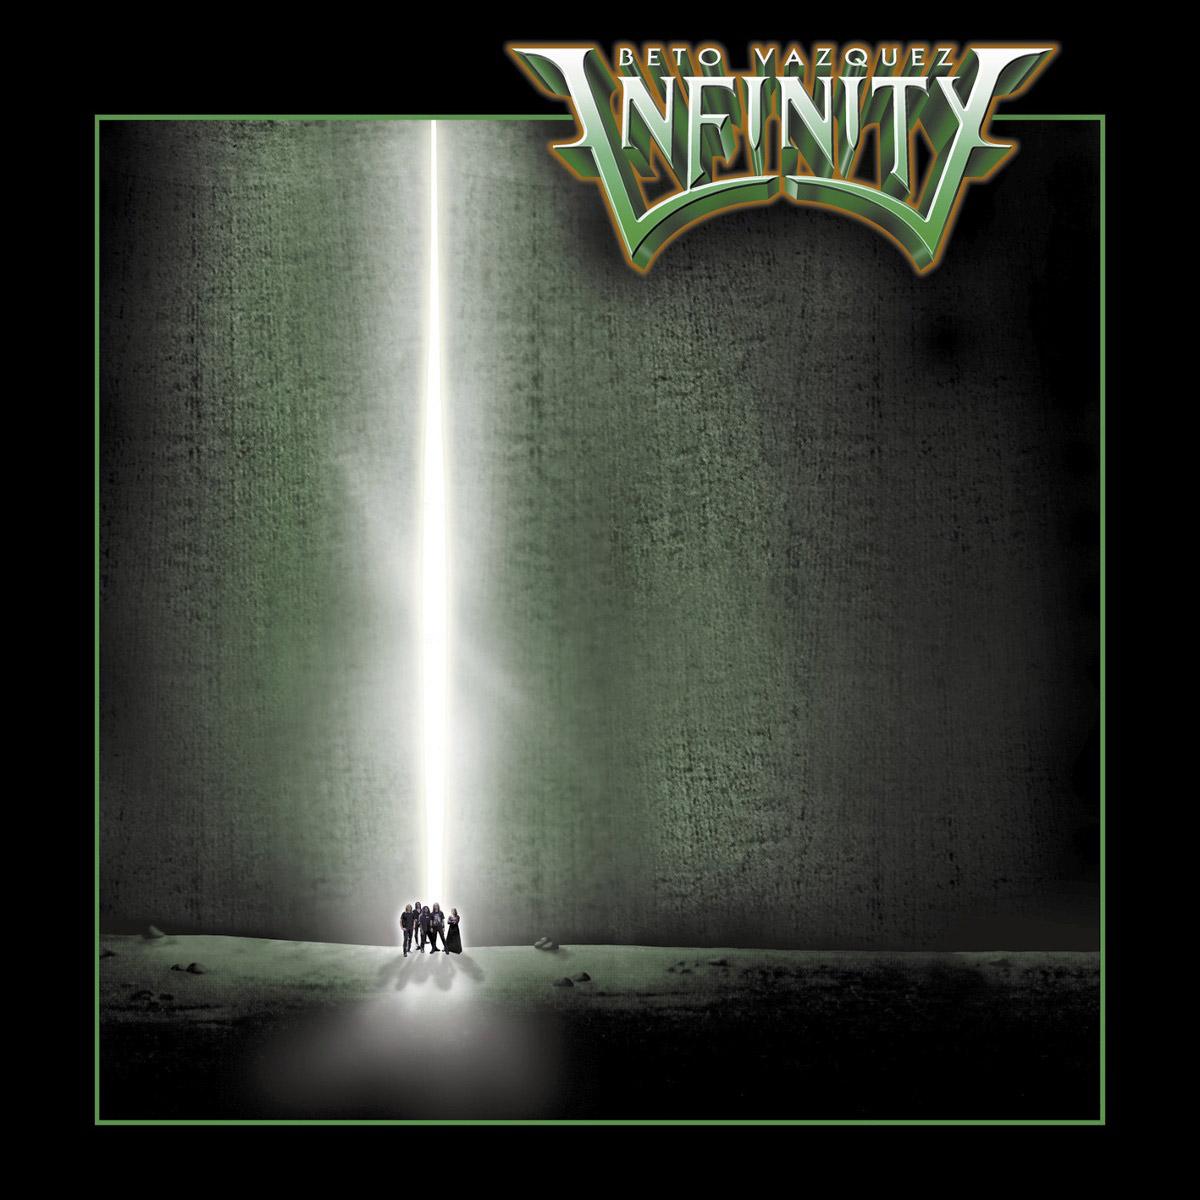 Beto Vazquez Infinity - Beto Vazquez Infinity